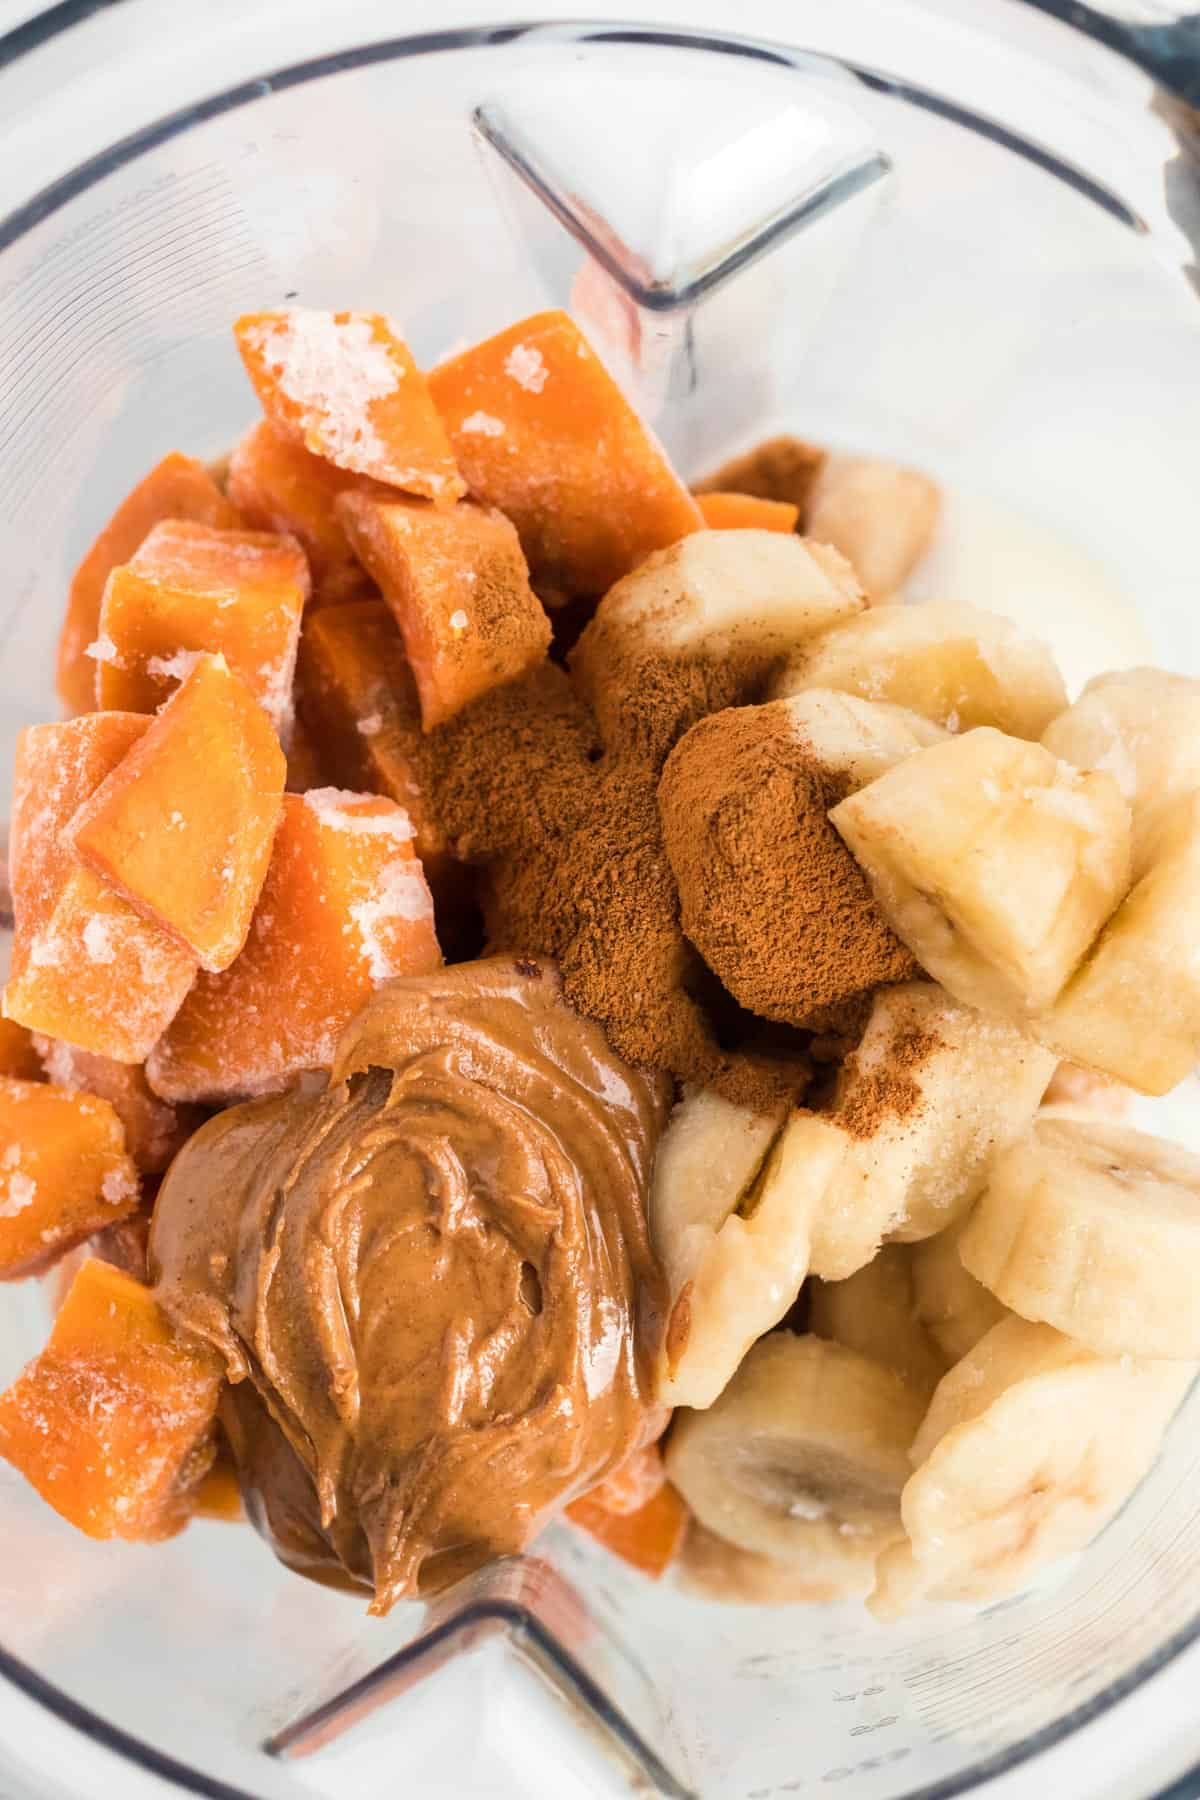 sweet potato smoothie ingredients inside the blender